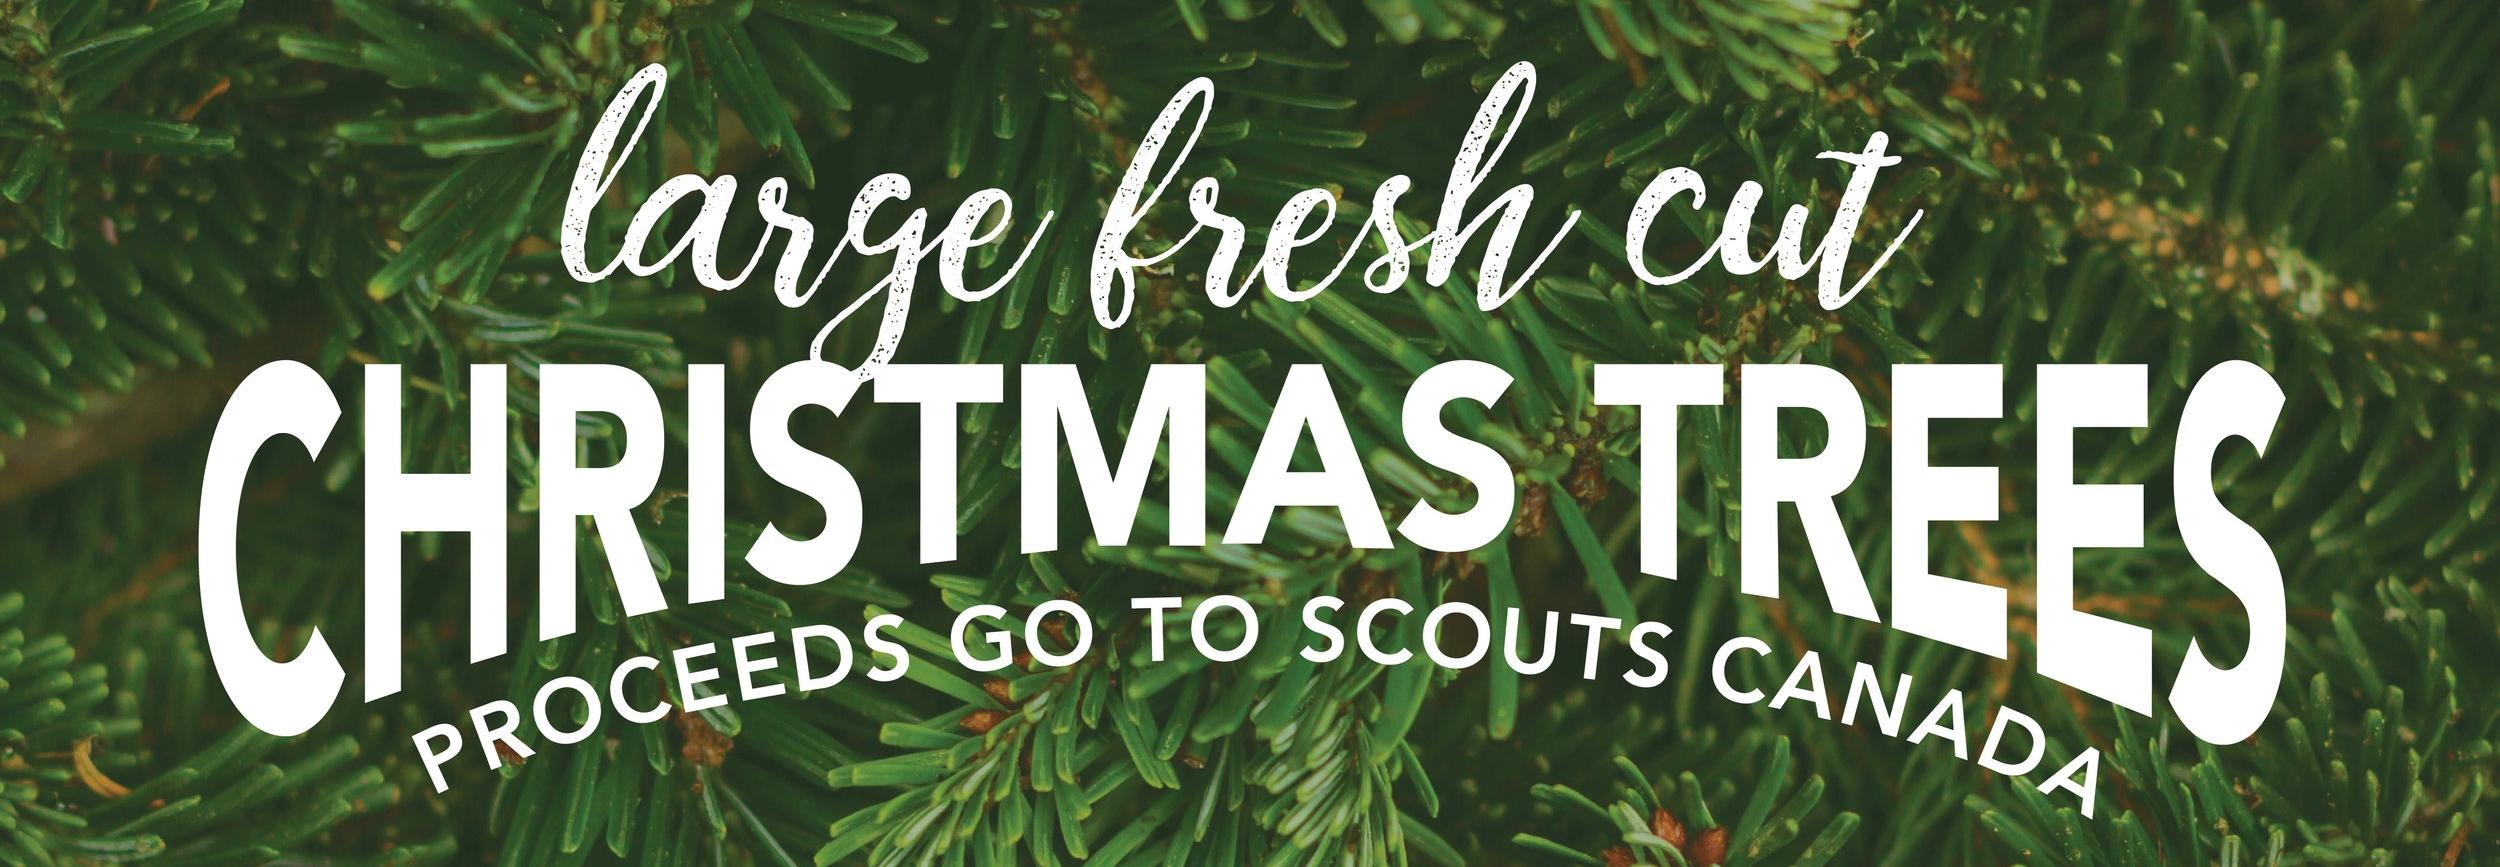 17_11_10-Boy Scout Christmas Tree Sign1-01.jpg